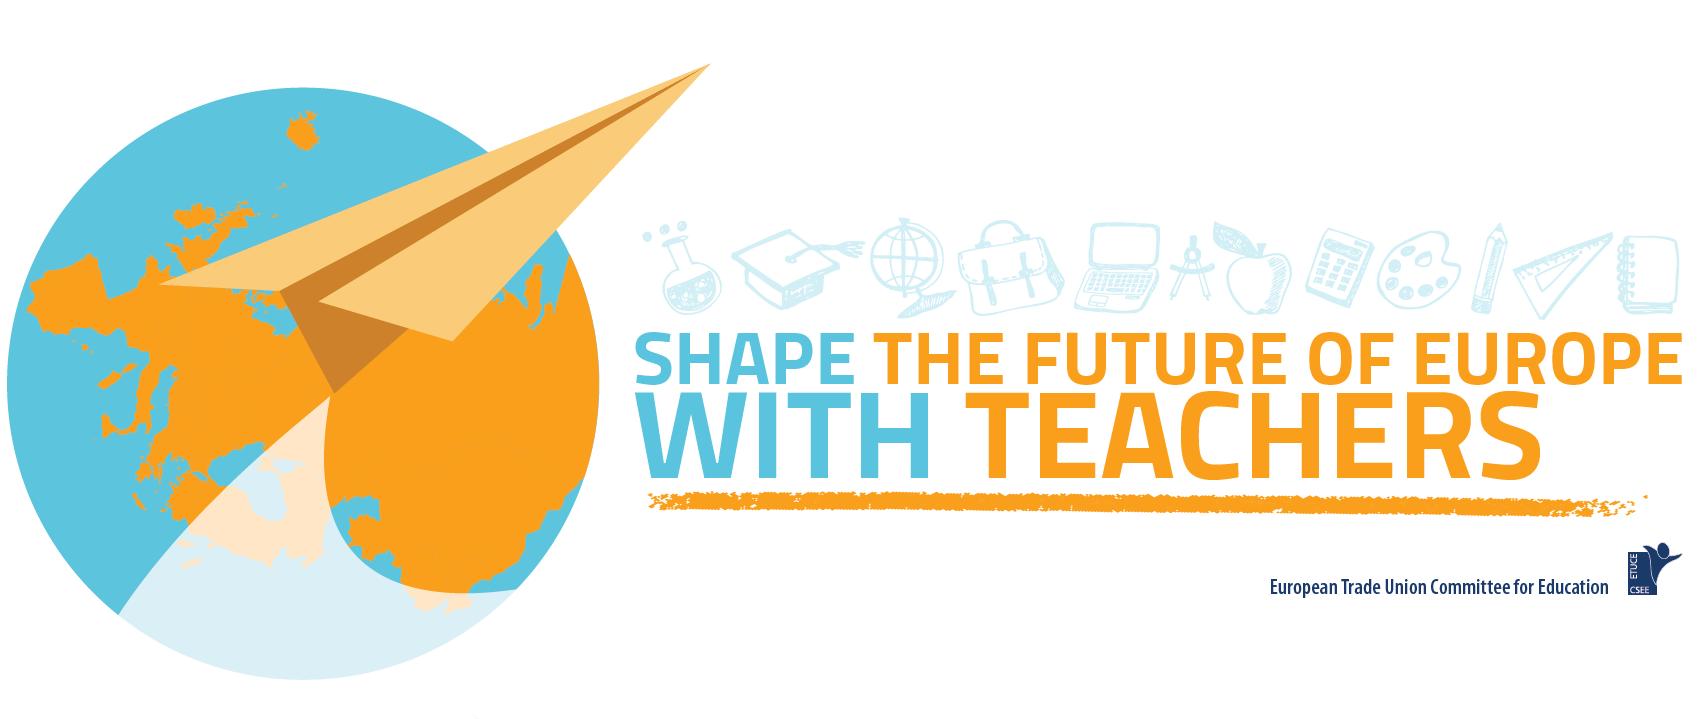 Shape the Future of Europe with Teachers